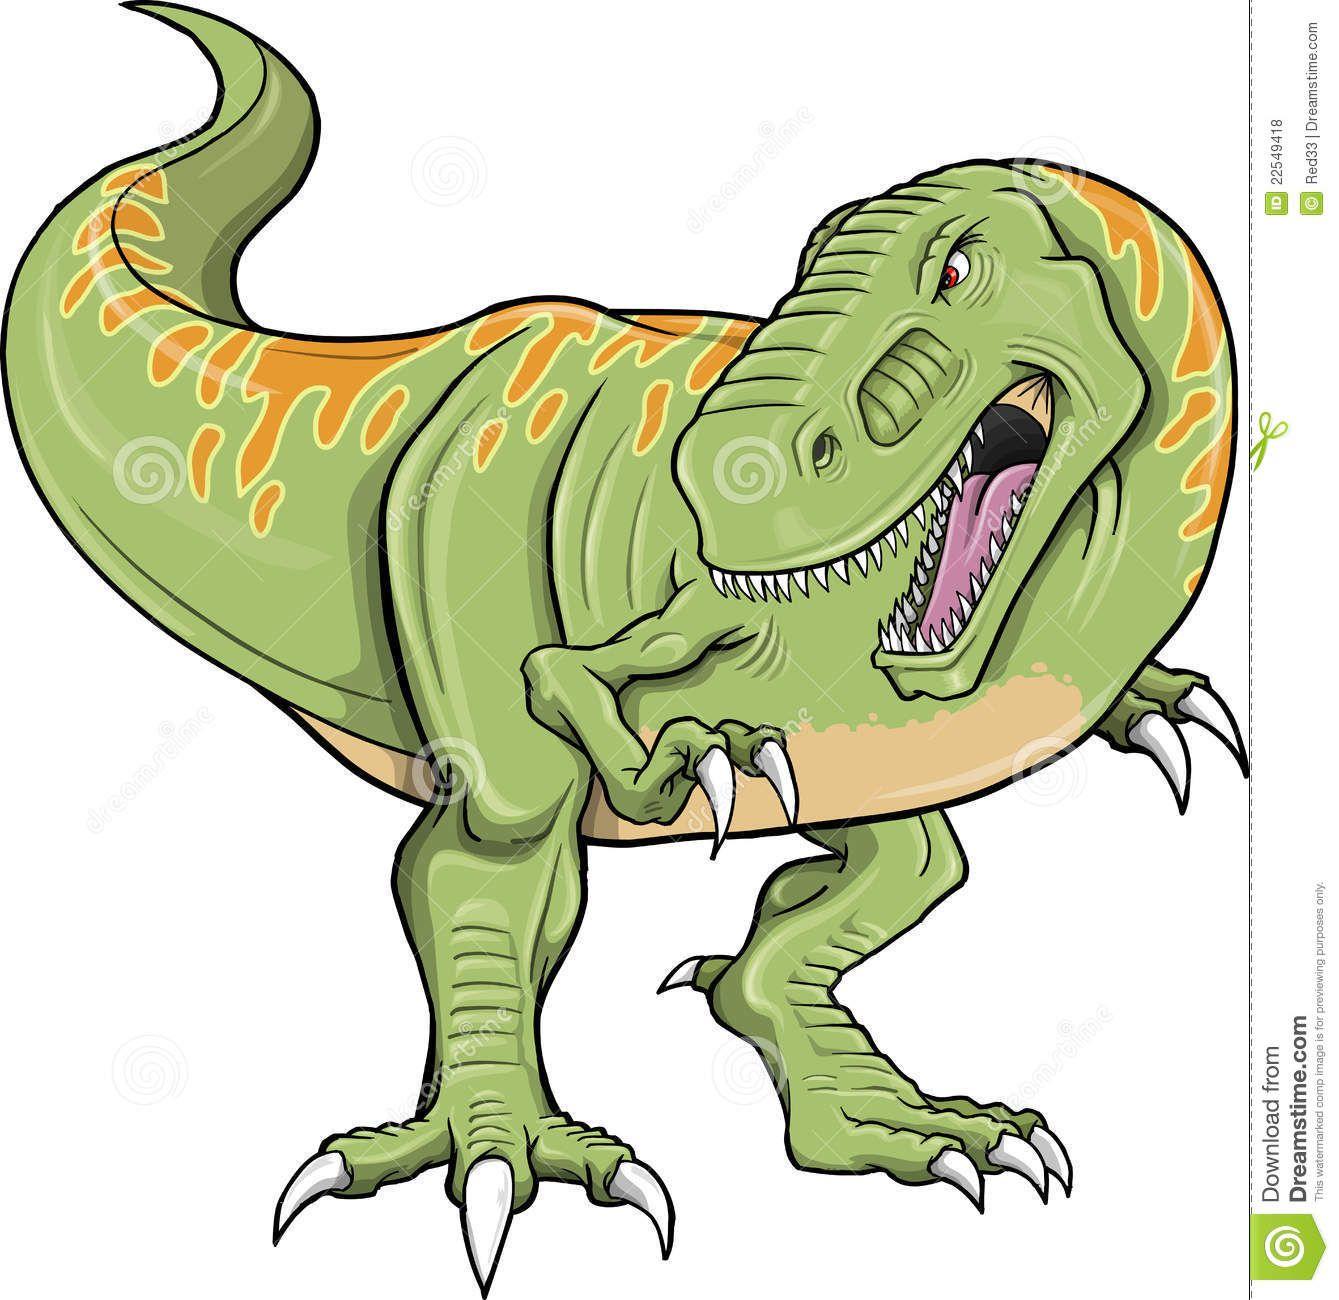 Tyrannosaurus Rex Dinosaur Vector Royalty Free Stock Photo - Image ...